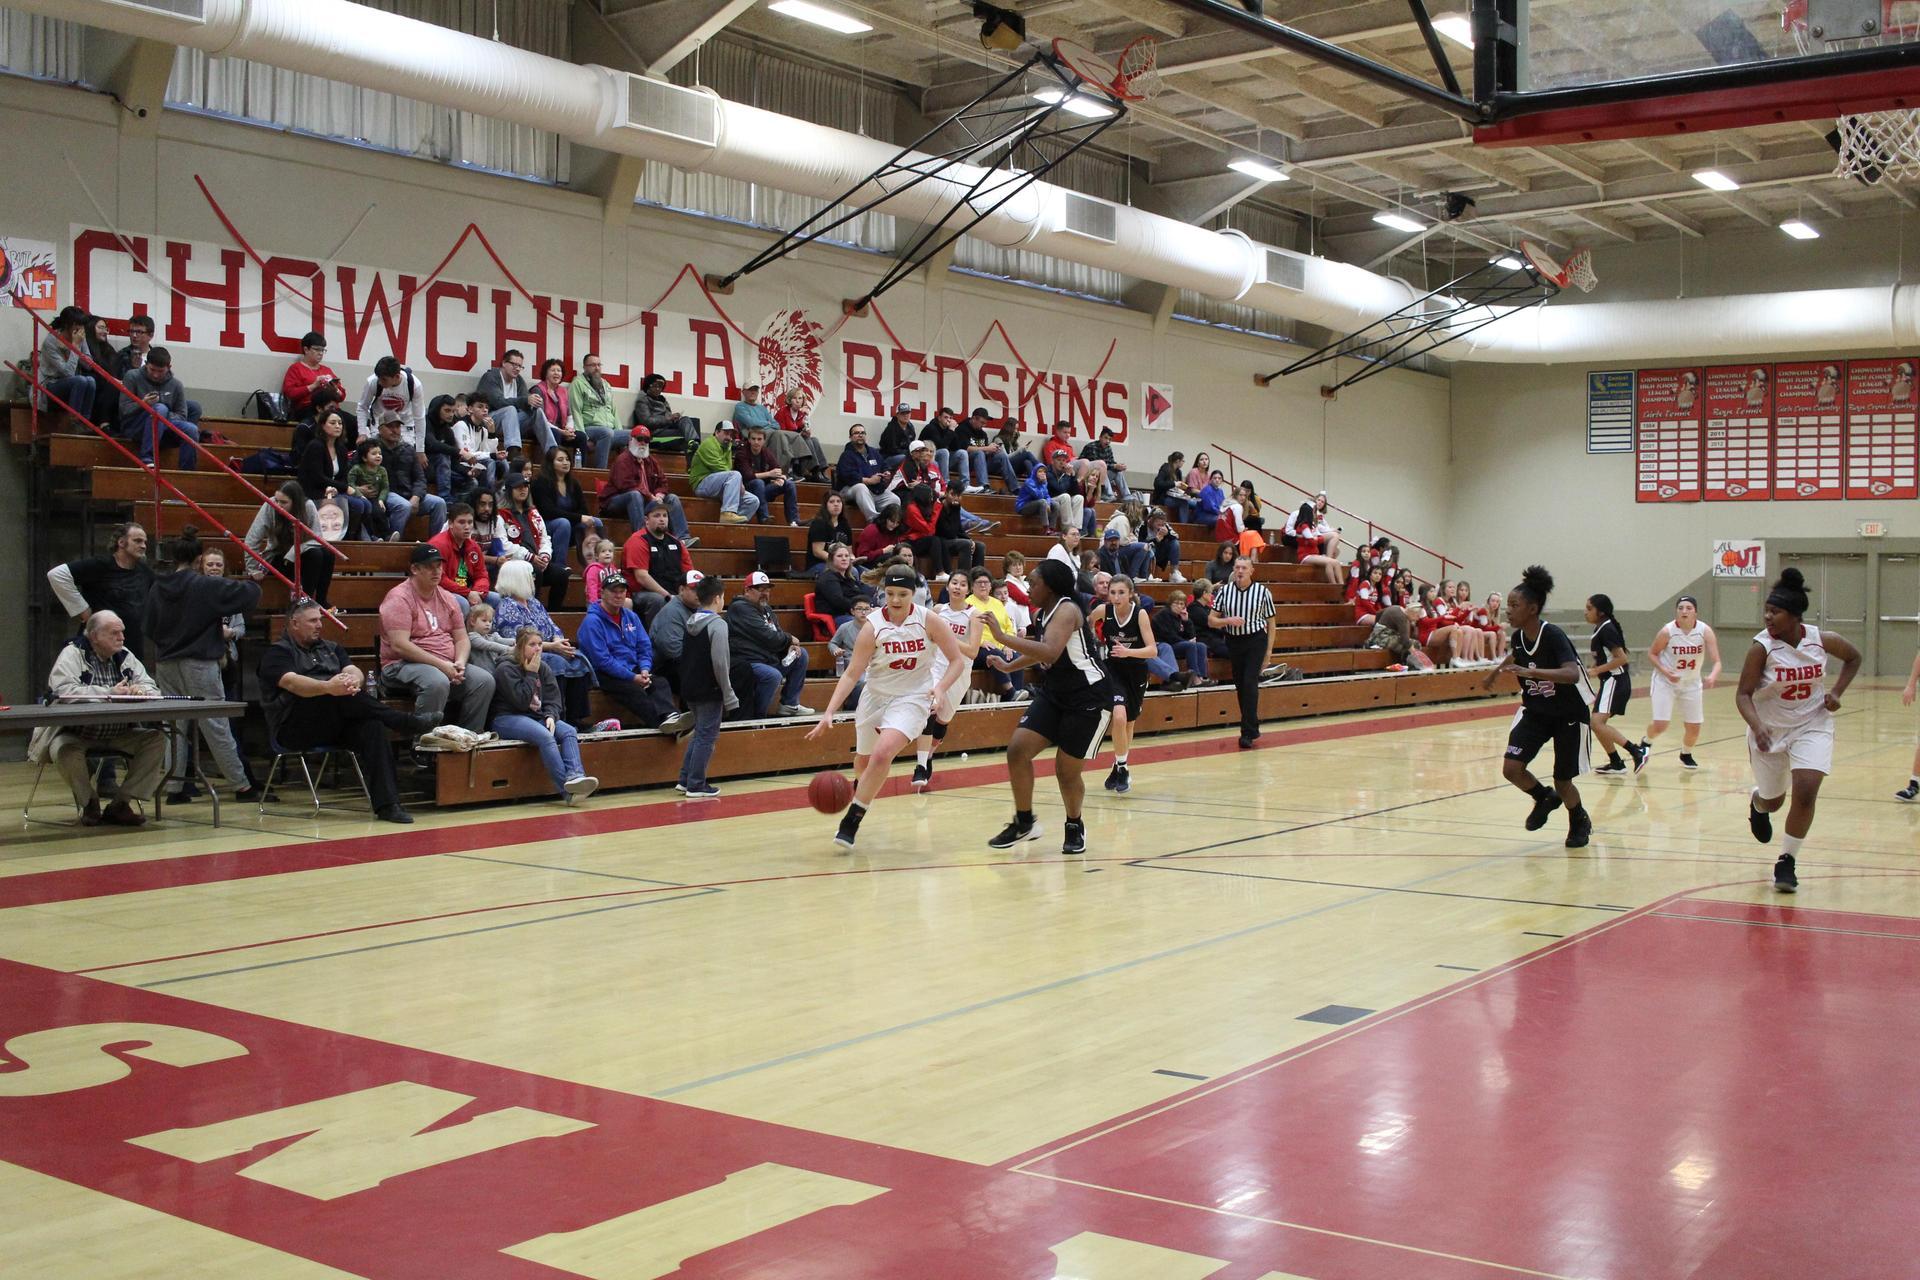 JV Girls playing basketball against Washington Union